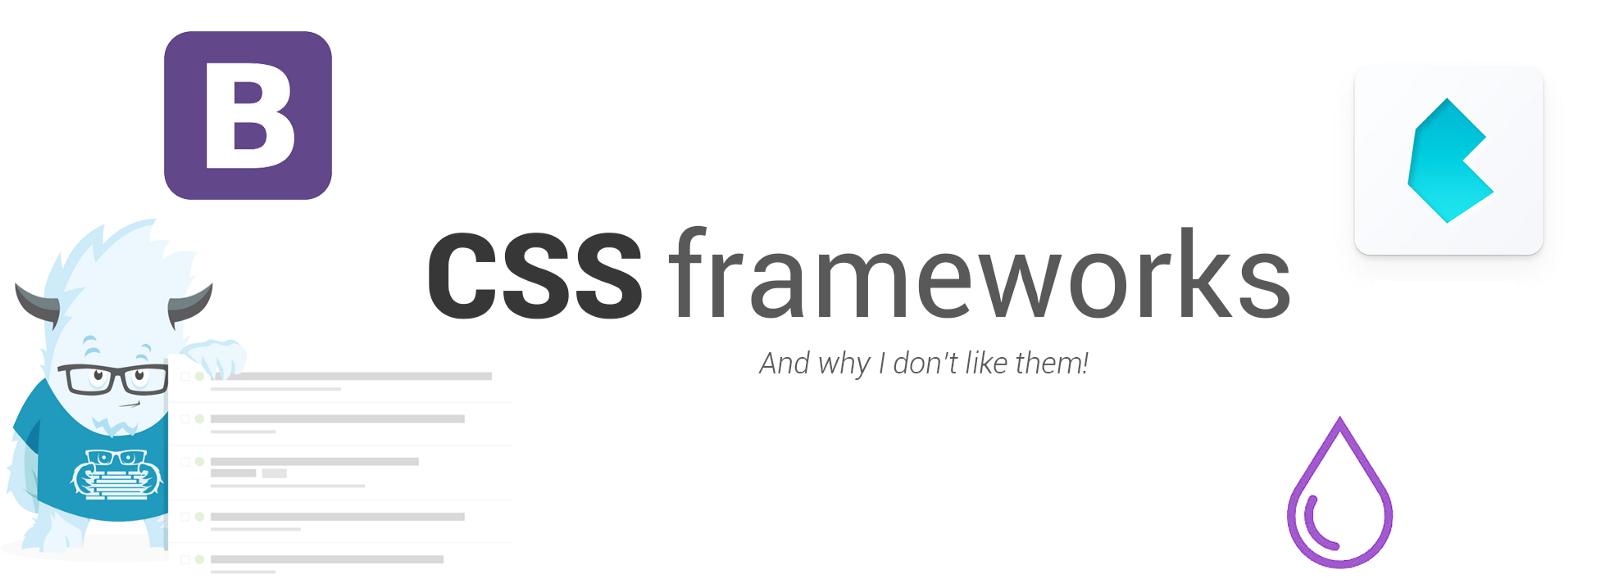 /a-case-against-css-frameworks-bea9a6997f8e feature image